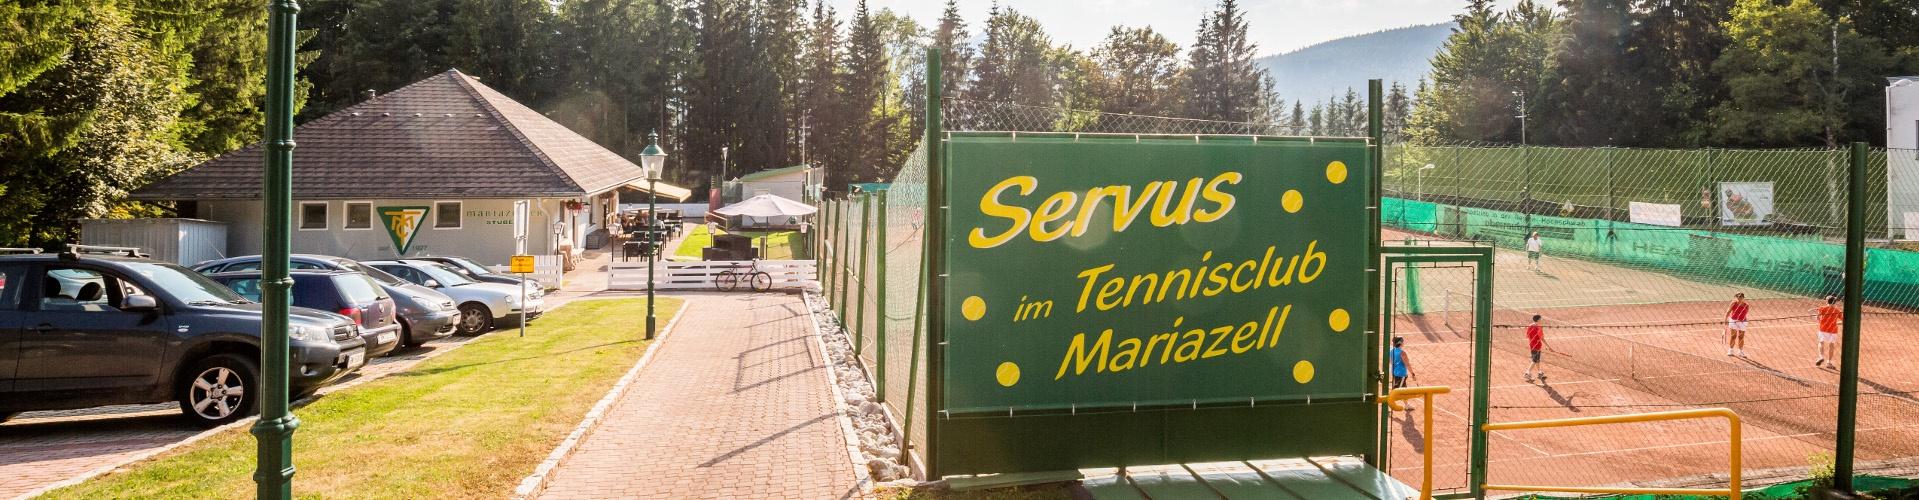 Tennisplatz, © UTC Mariazell, Foto: Fred Lindmoser